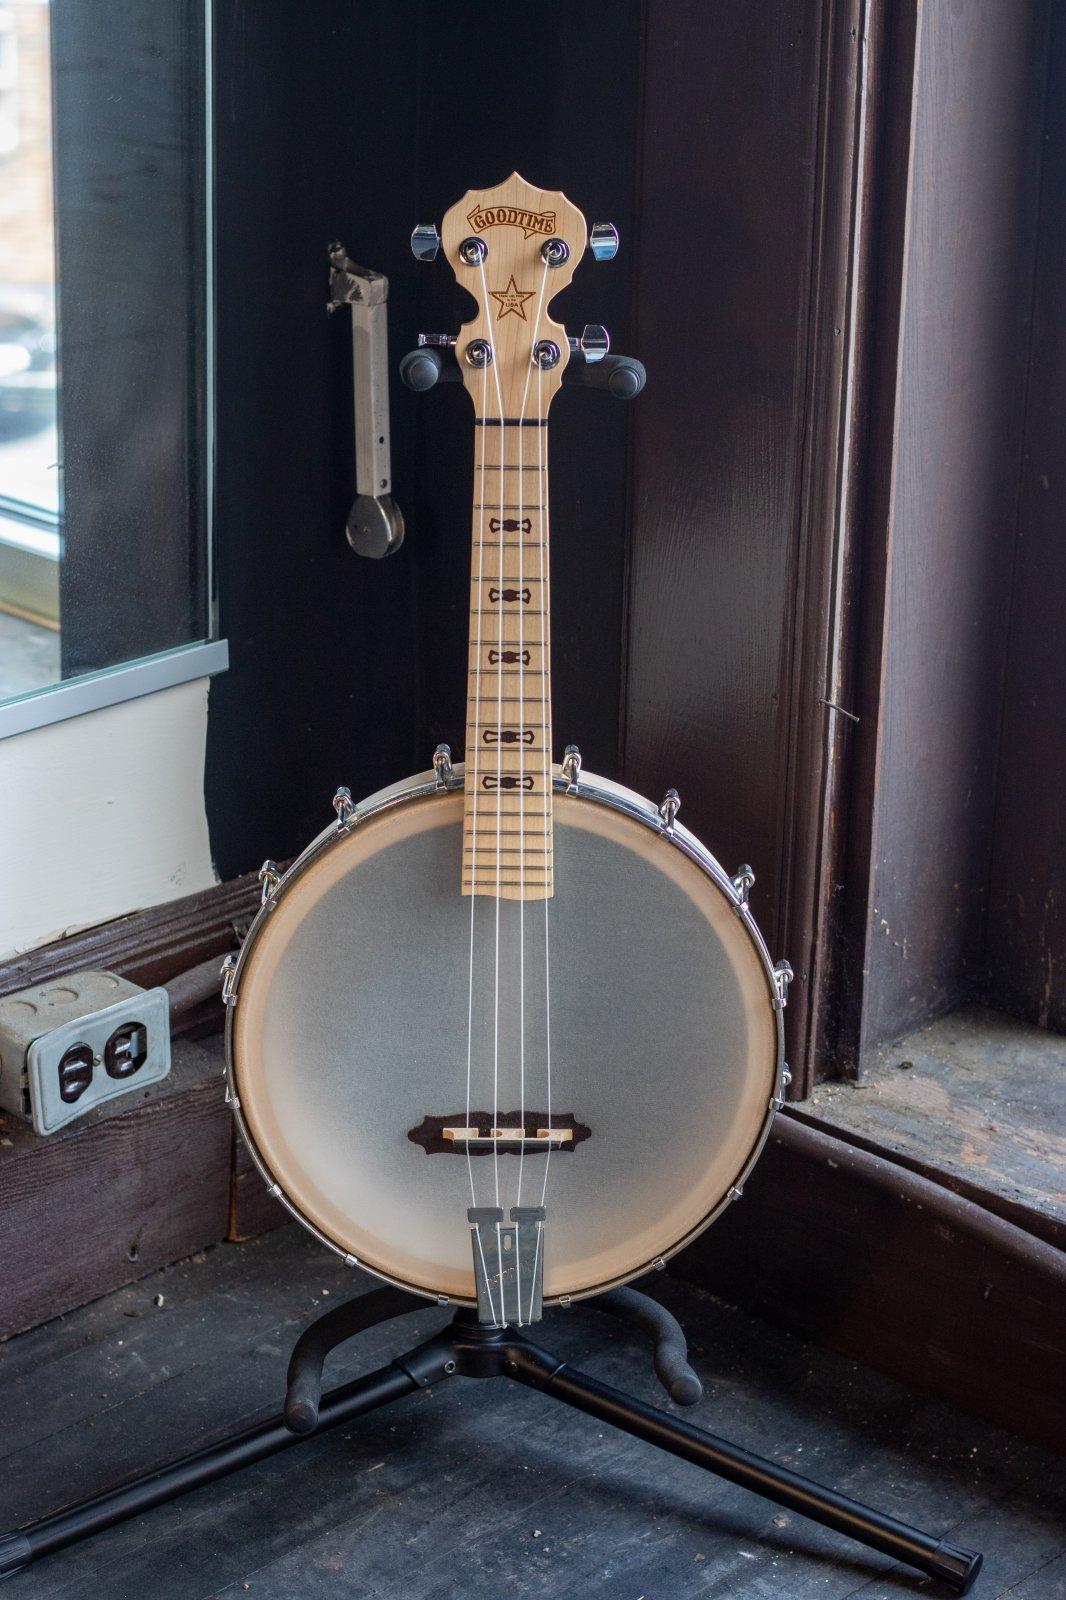 Goodtime Banjo Concert Ukulele